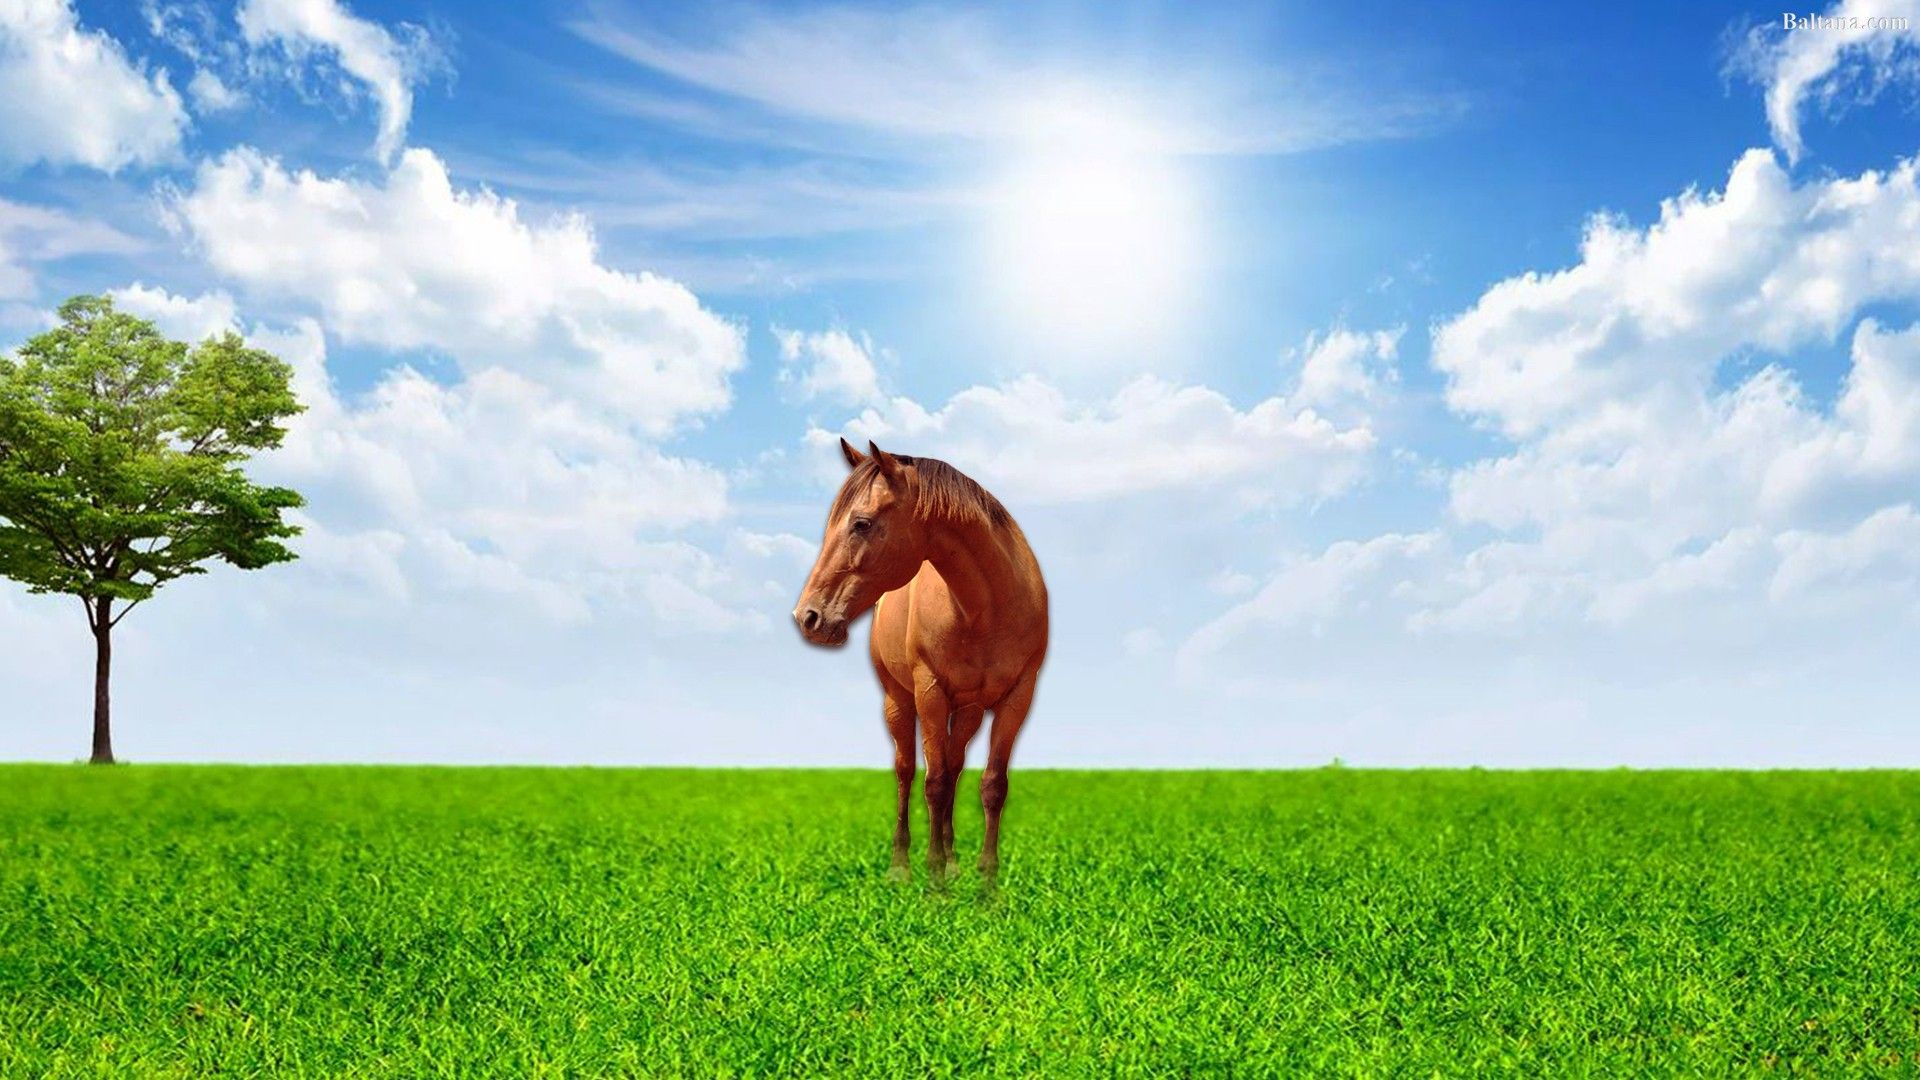 horse wallpaper free download